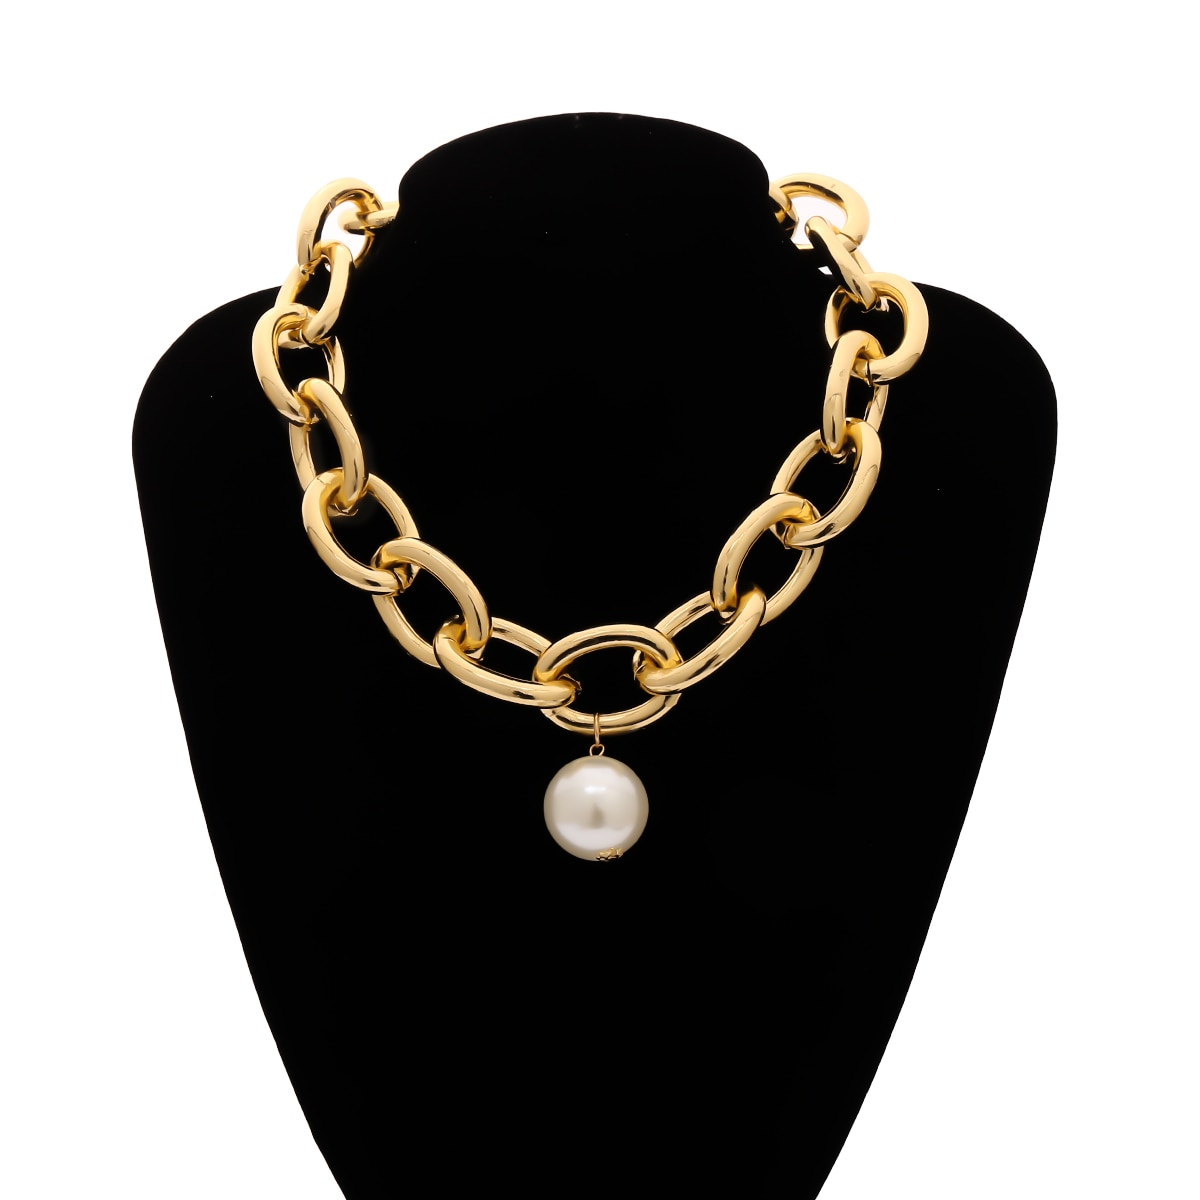 Купить с кэшбэком Gothic Big Imitation Pearl Pendant Choker Necklace Steampunk Men Hip Hop Heavy Metal Chunky Lock Chain Necklace Women Jewelry